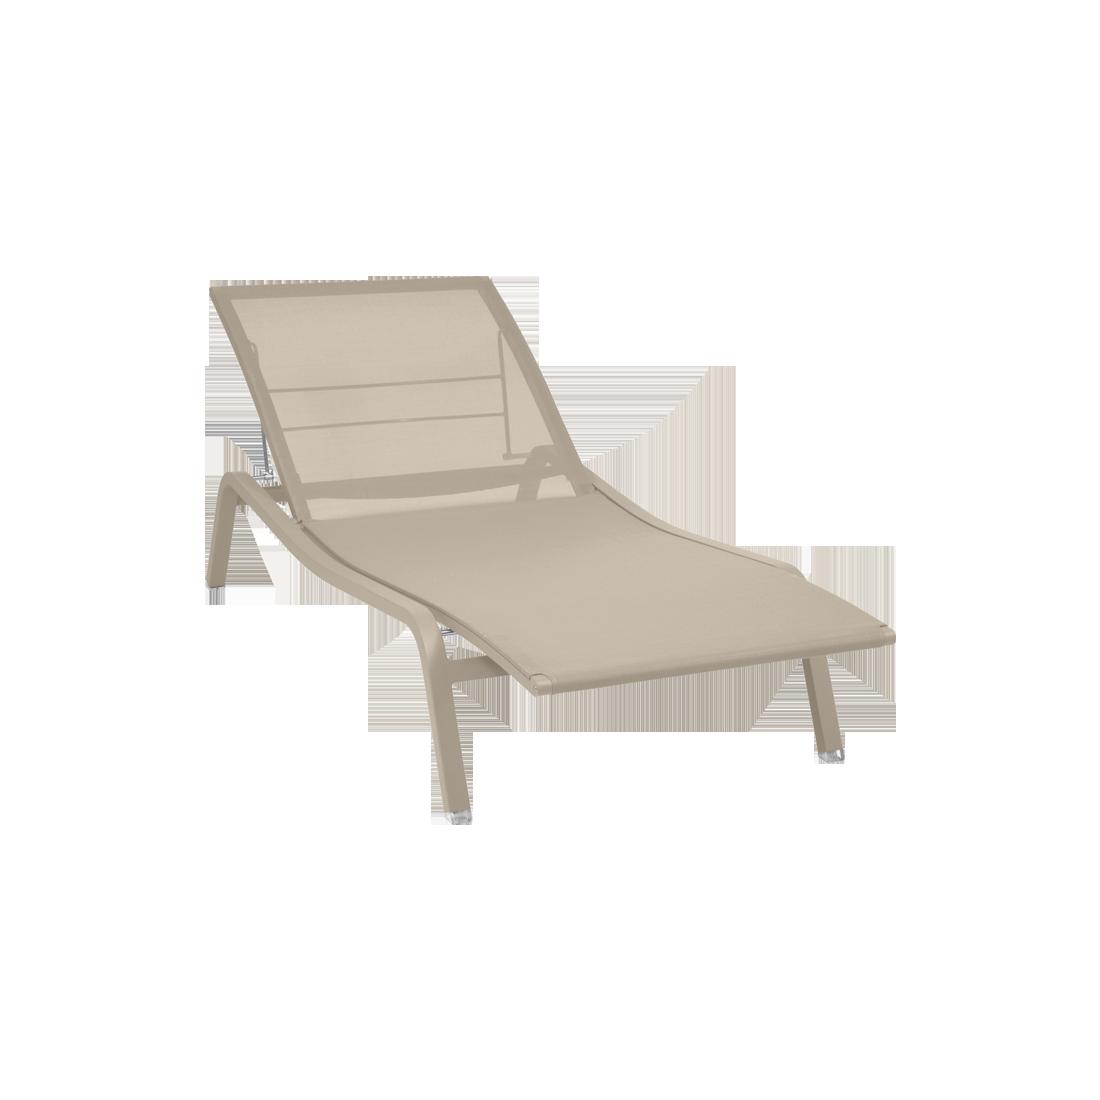 aliz sunlounger garden chaise longue. Black Bedroom Furniture Sets. Home Design Ideas